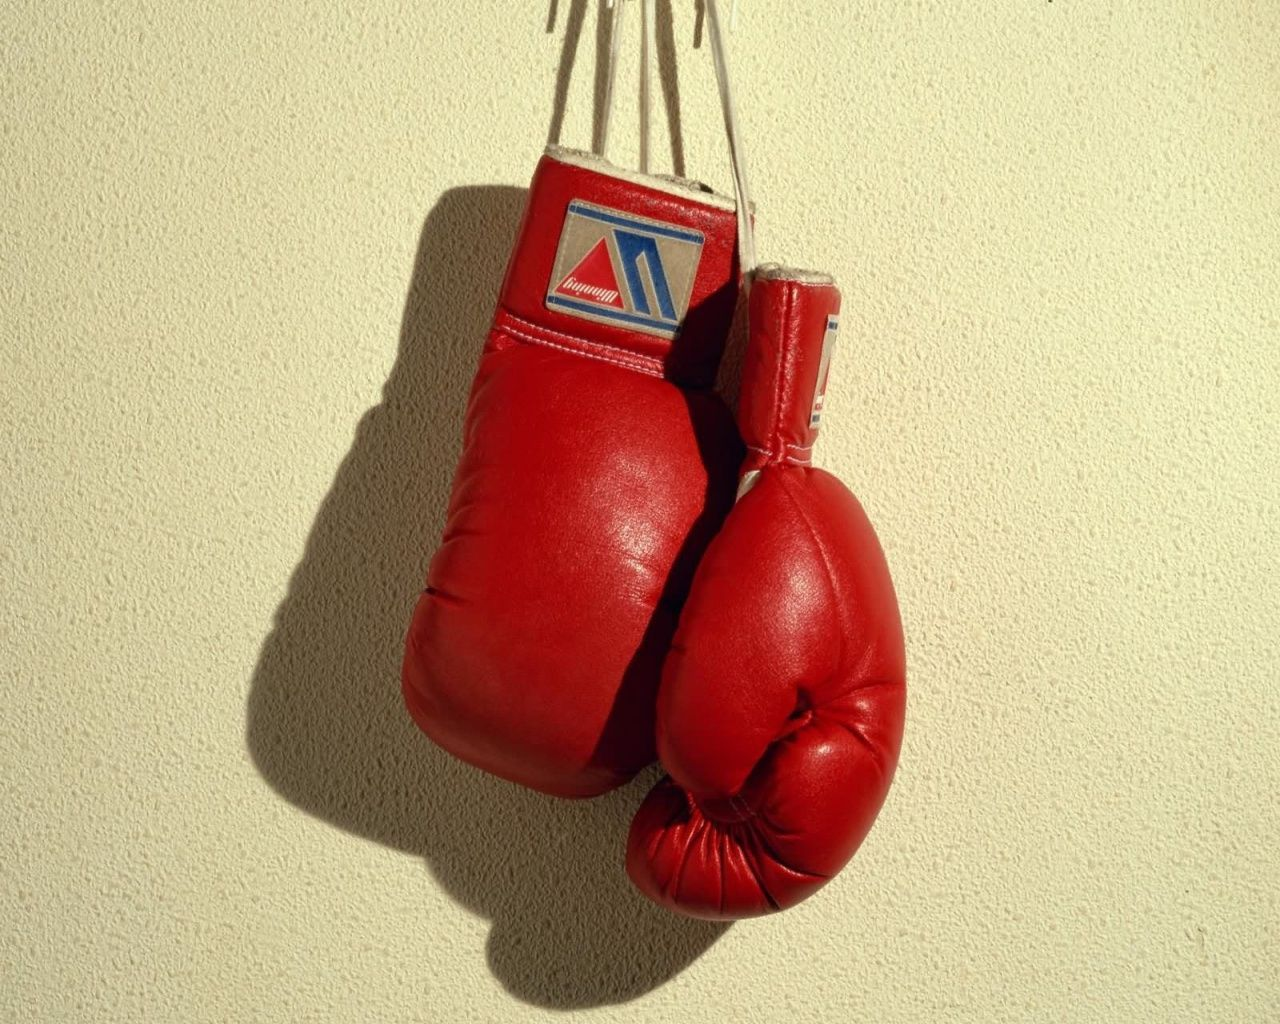 красивые картинки на тему бокса хотел